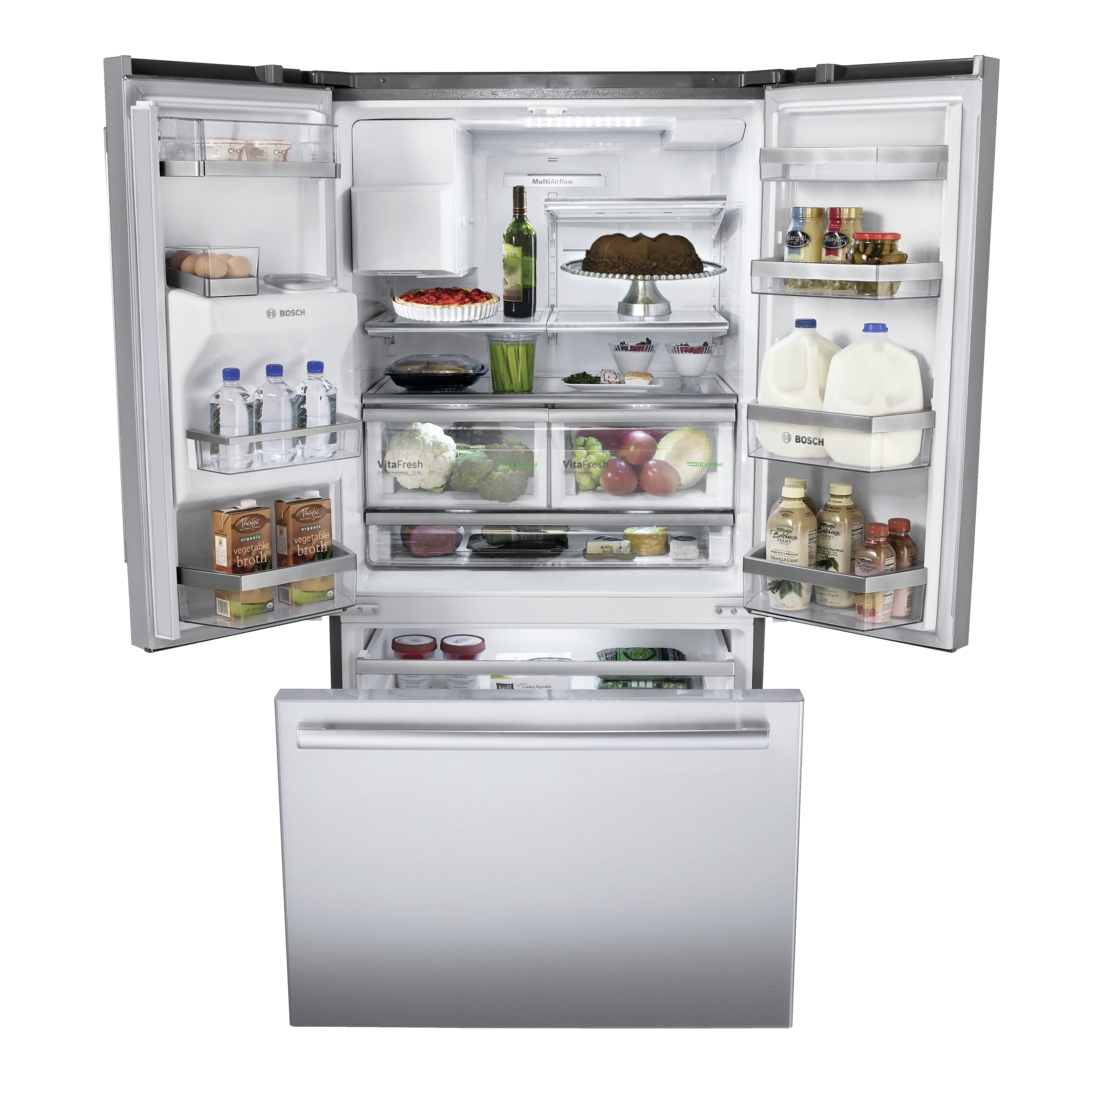 Cabanu_electrodomestico_MCSA01649320_B26FT70SNS-Bosch-Refrigerator-Open Door_def.jpg